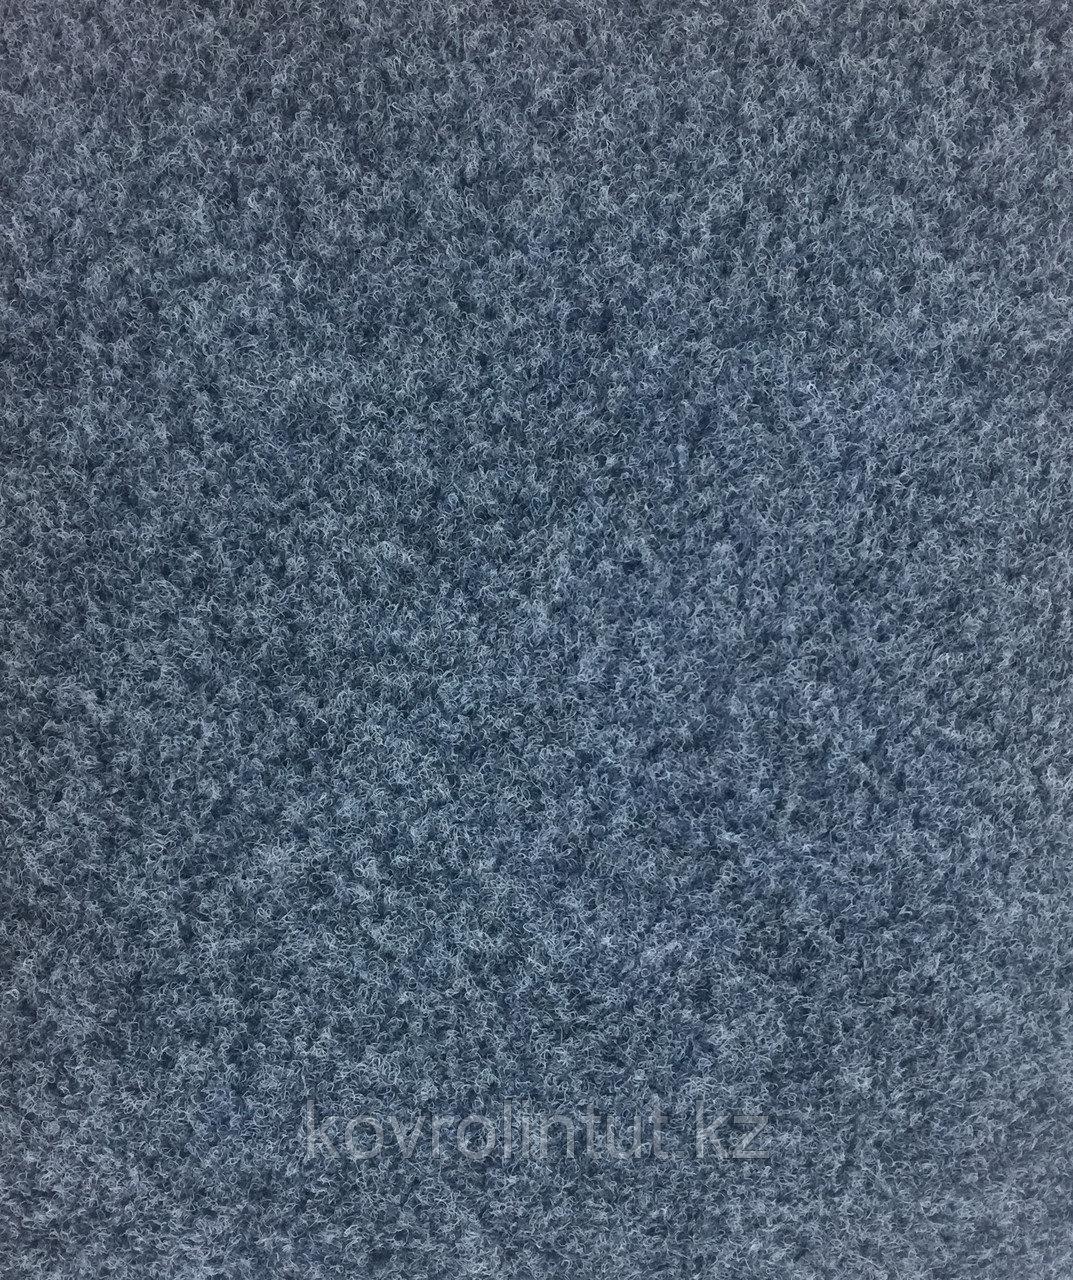 Ковролин Примавера 2531, серый 4 м опт/розн